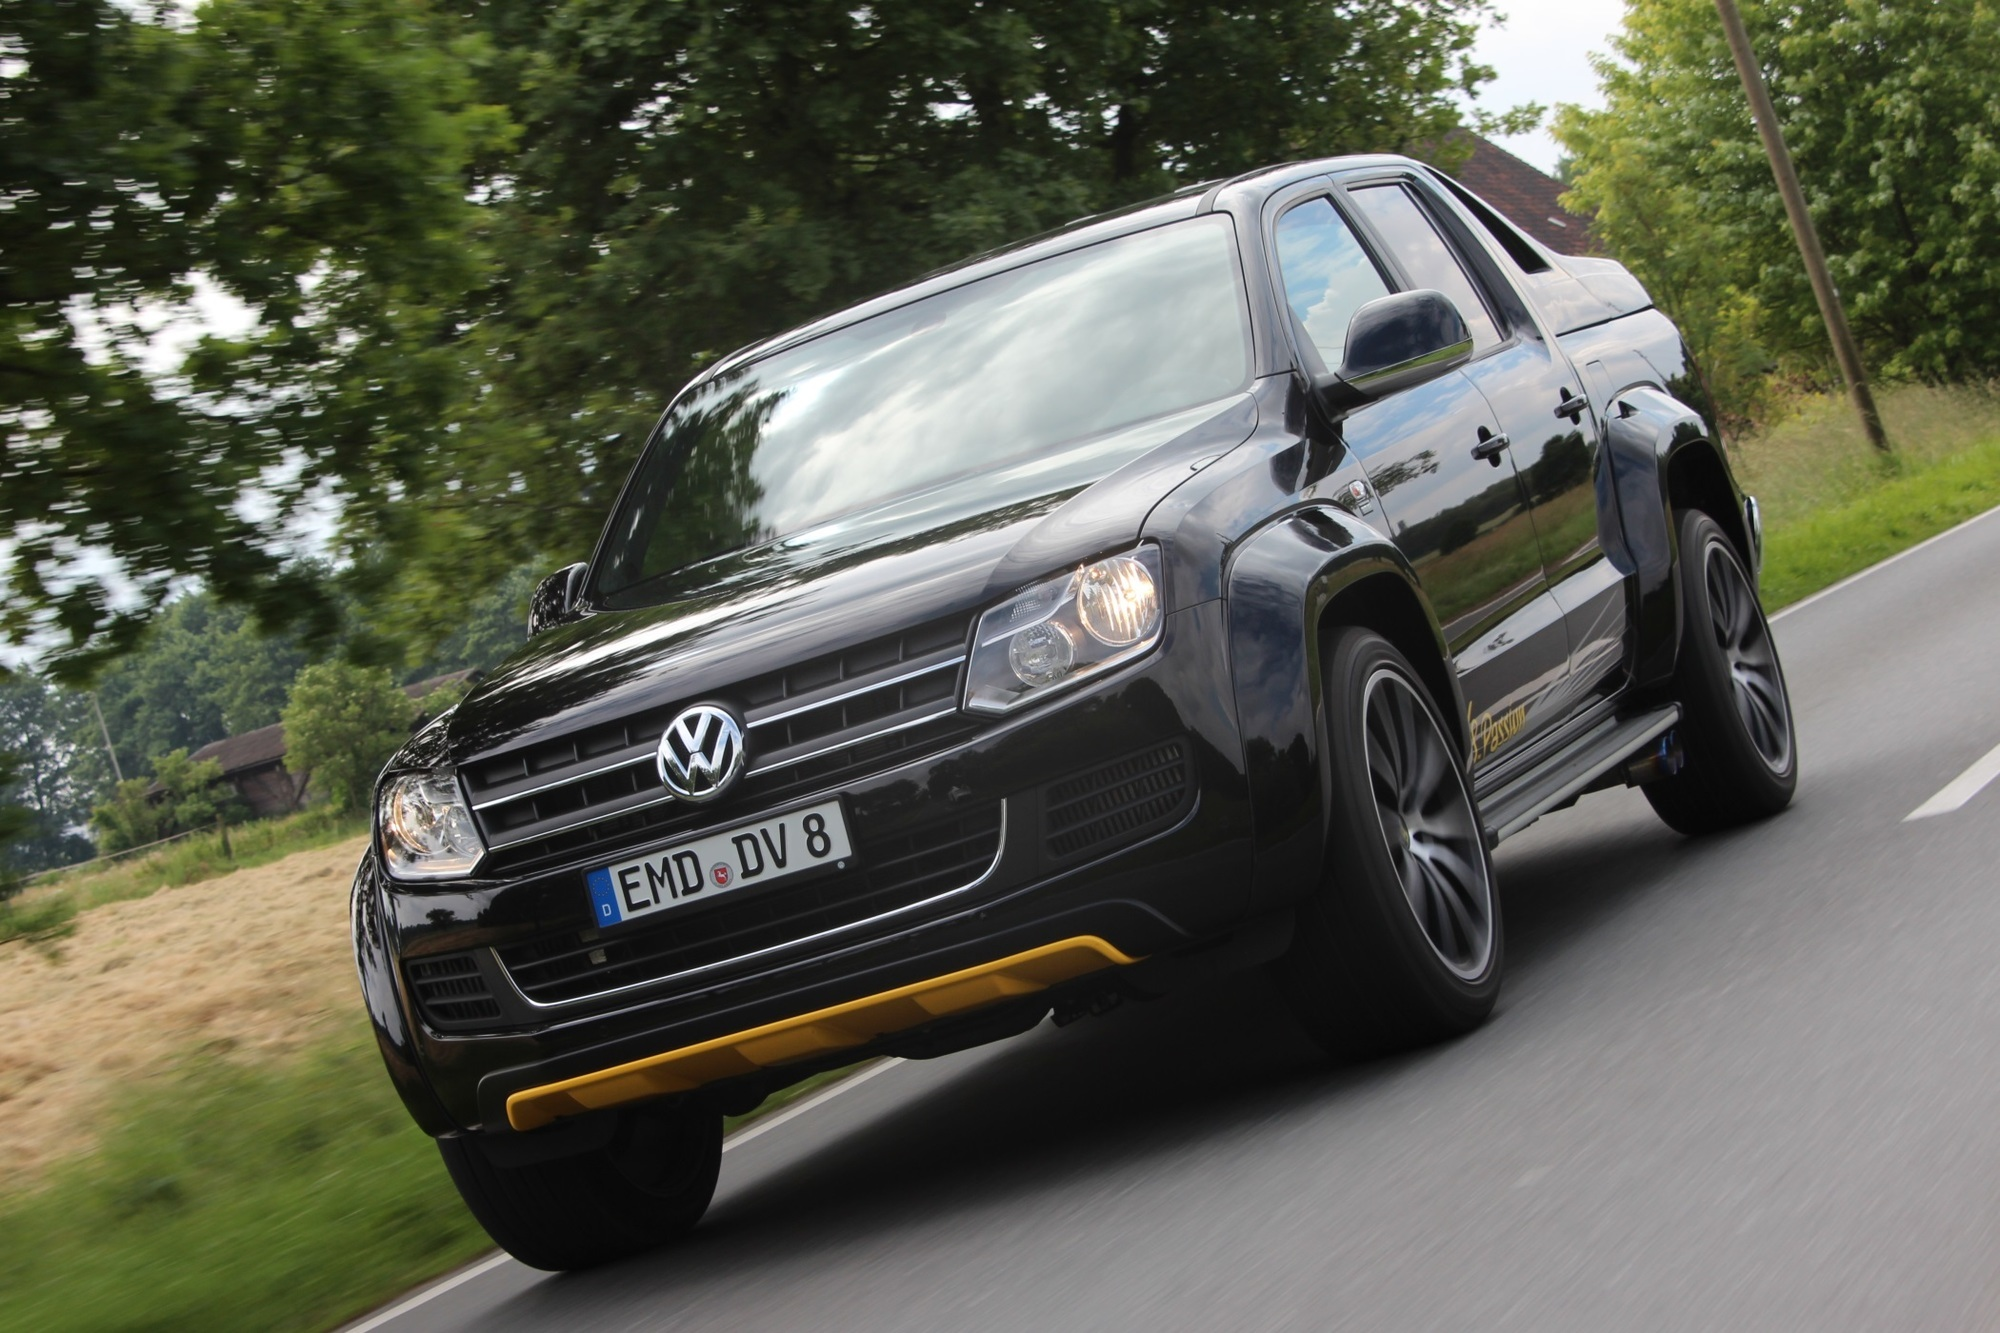 Panorama: VW Amarok V8 - Passion: Lust am Laster